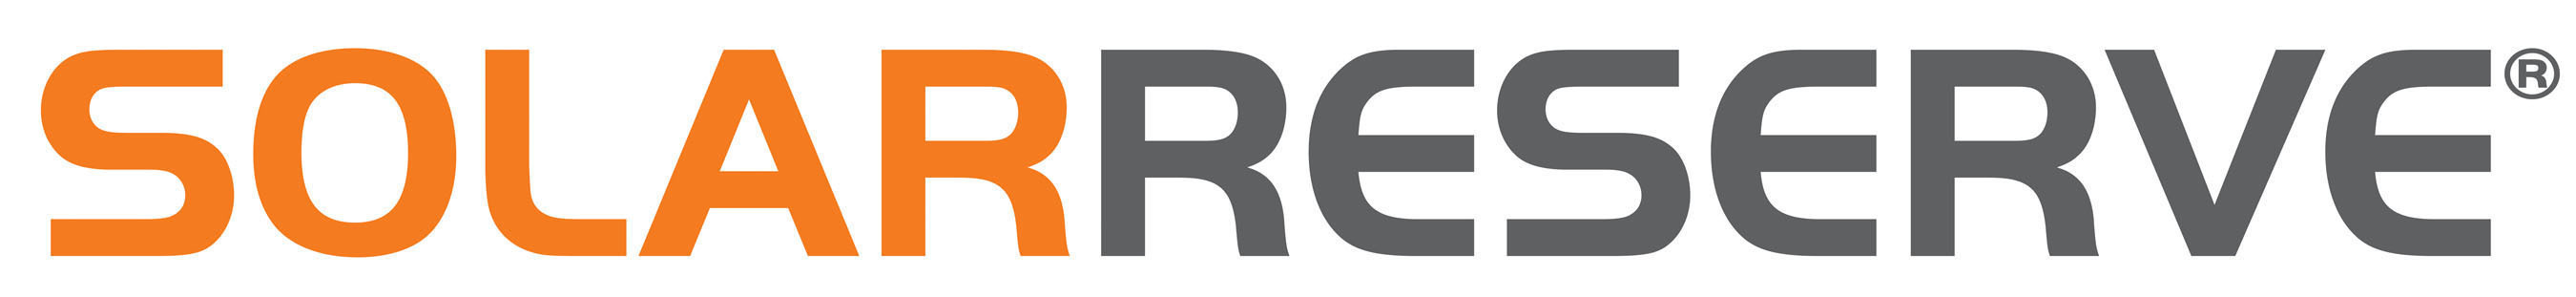 SolarReserve Logo.